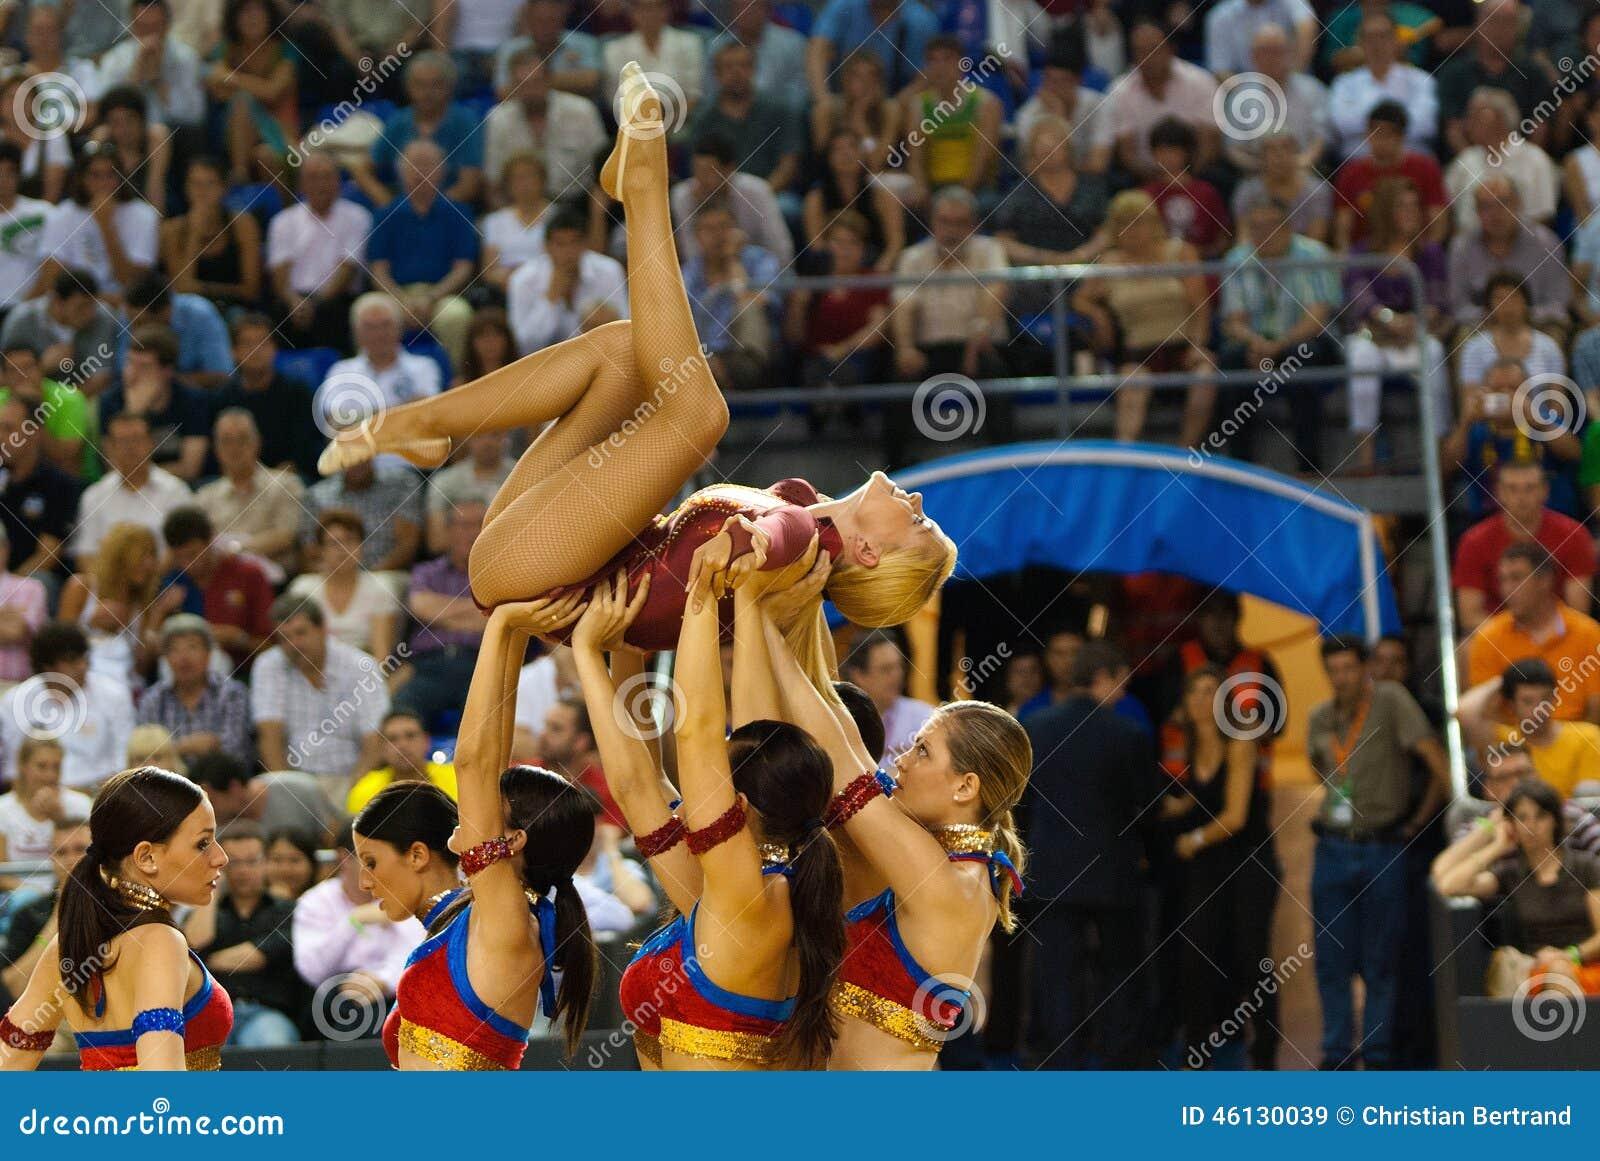 Cheerleaders at palau blaugrana editorial stock image for Puerta 0 palau blaugrana